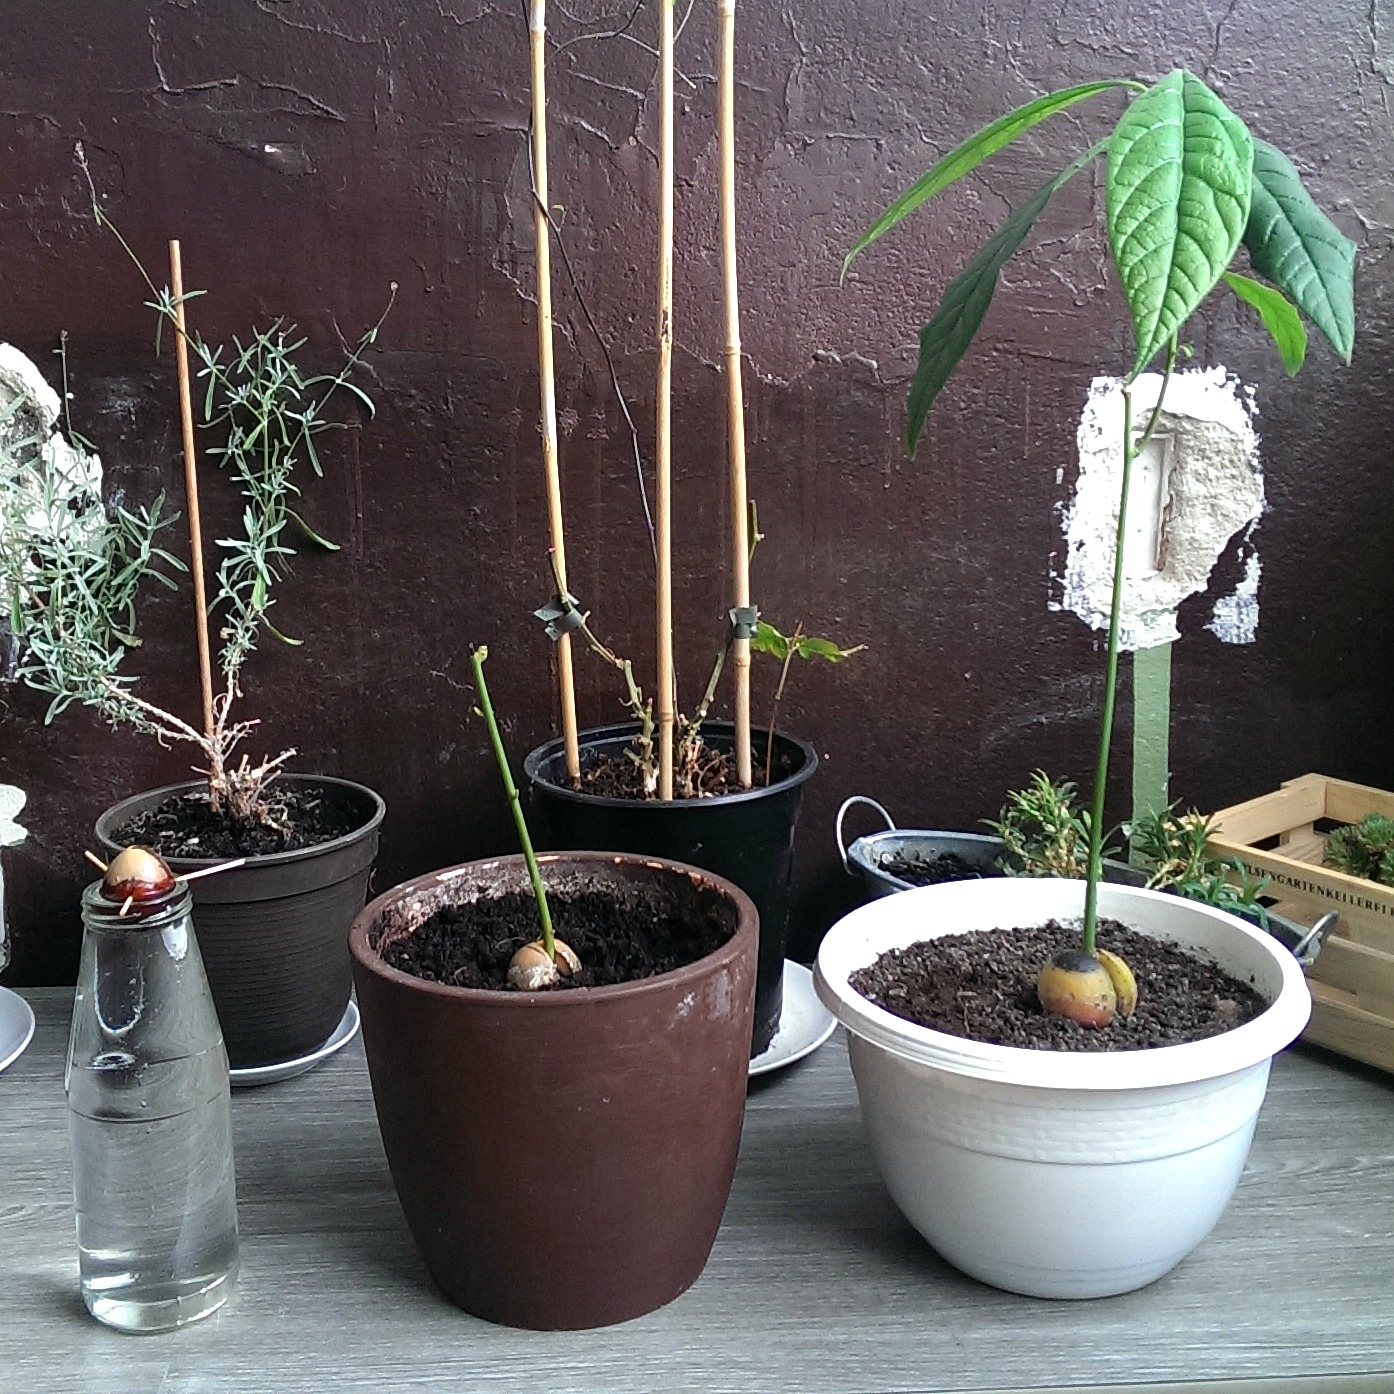 kukivegan avocadolove grow your own avocadotree. Black Bedroom Furniture Sets. Home Design Ideas